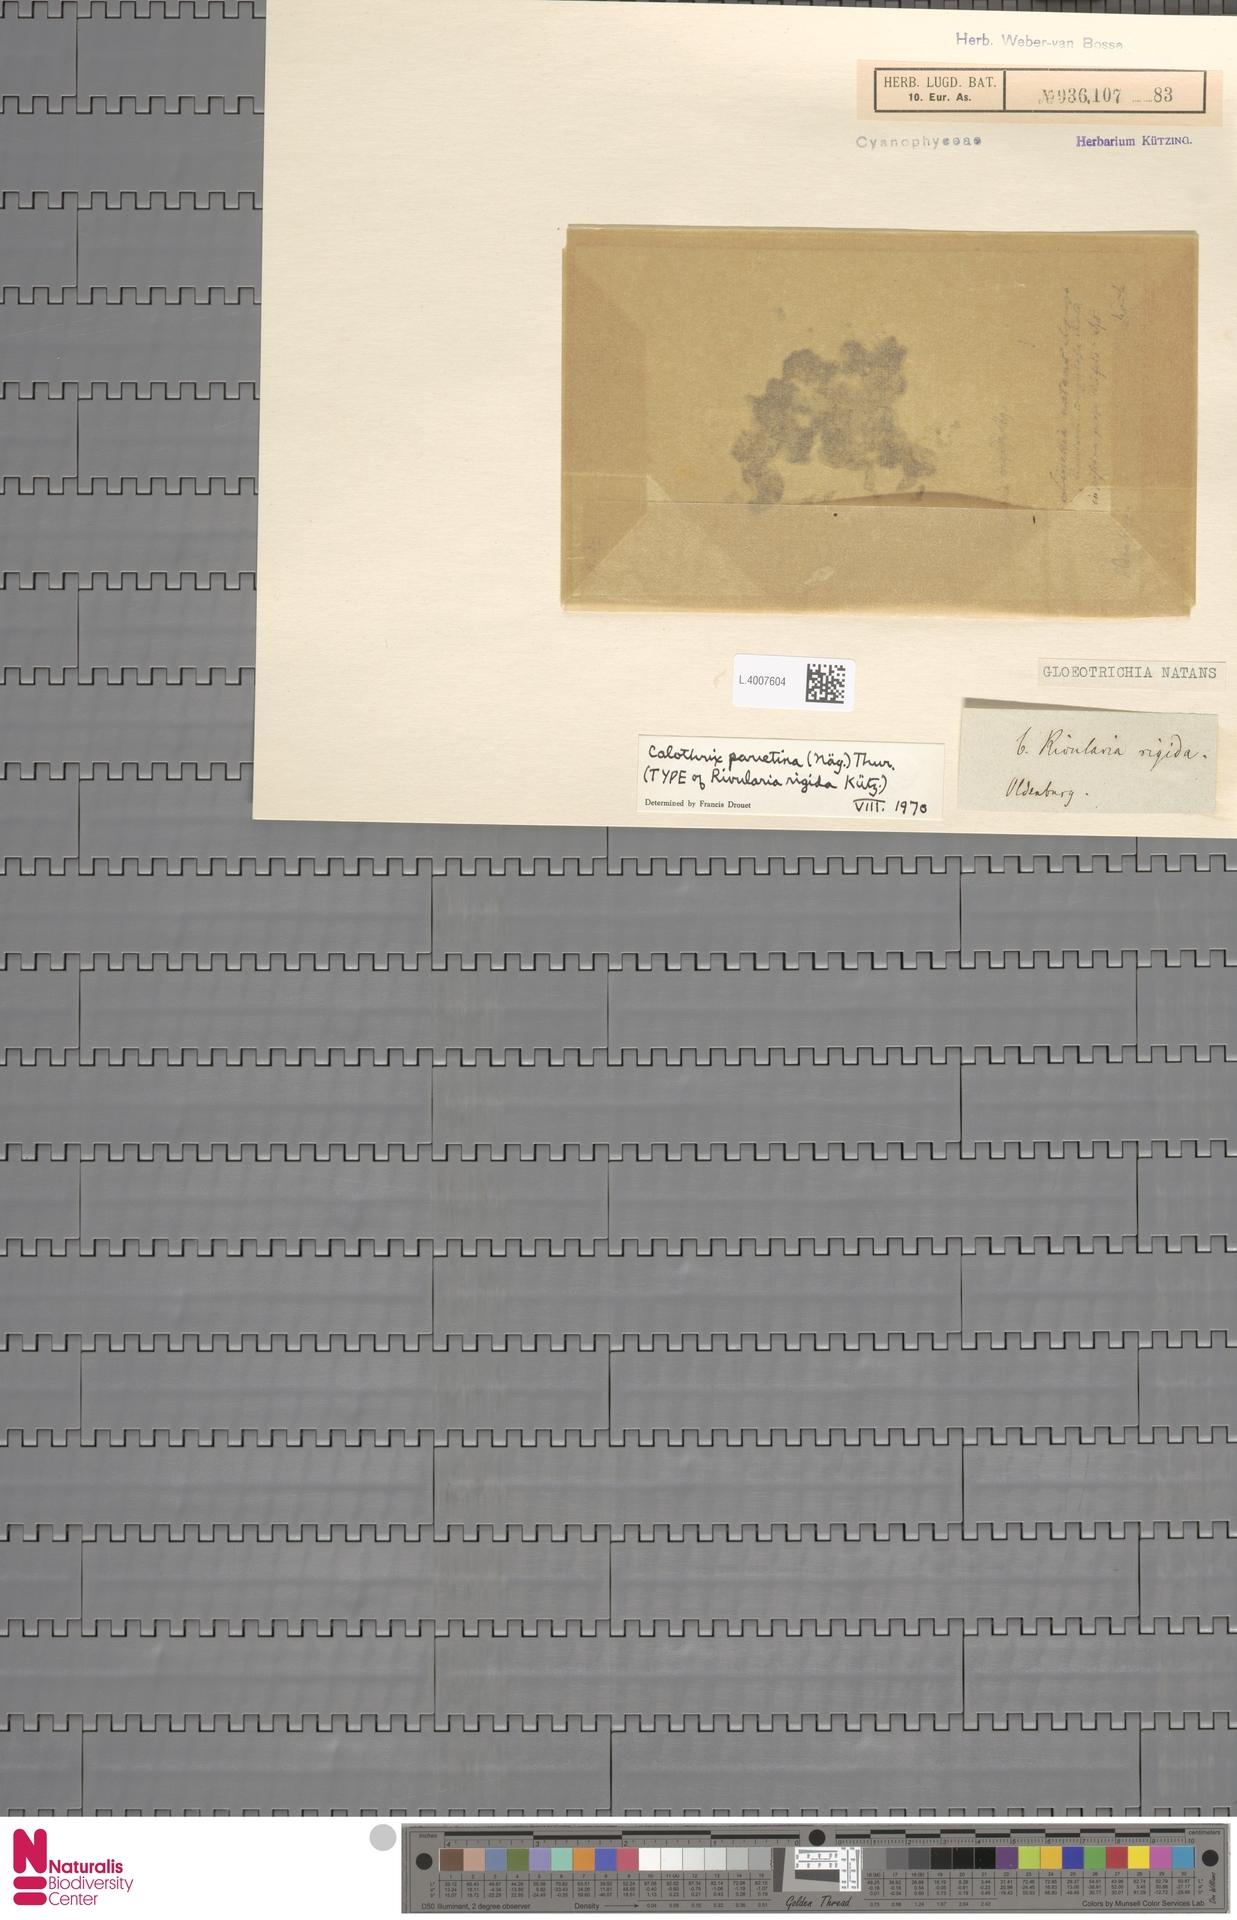 L.4007604 | Gloeotrichia natans (Hedw.) Rabenh. ex Bornet & Flahault